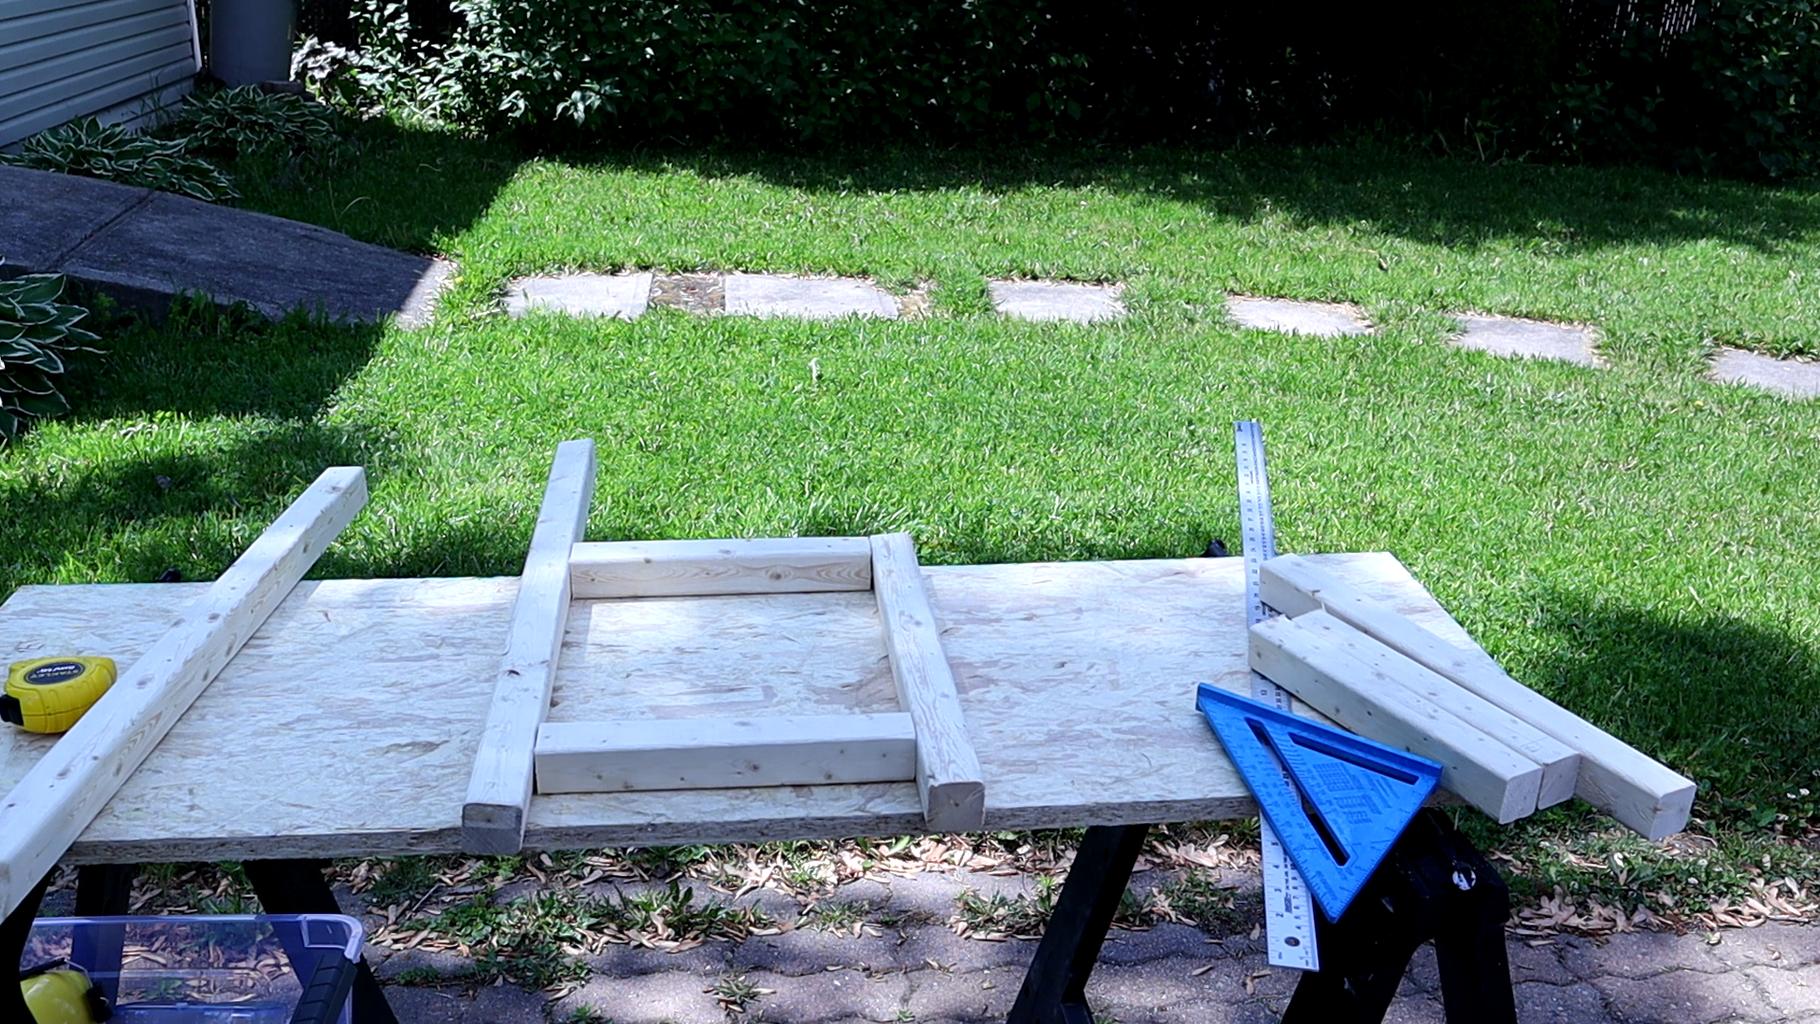 Build the Chair Frame